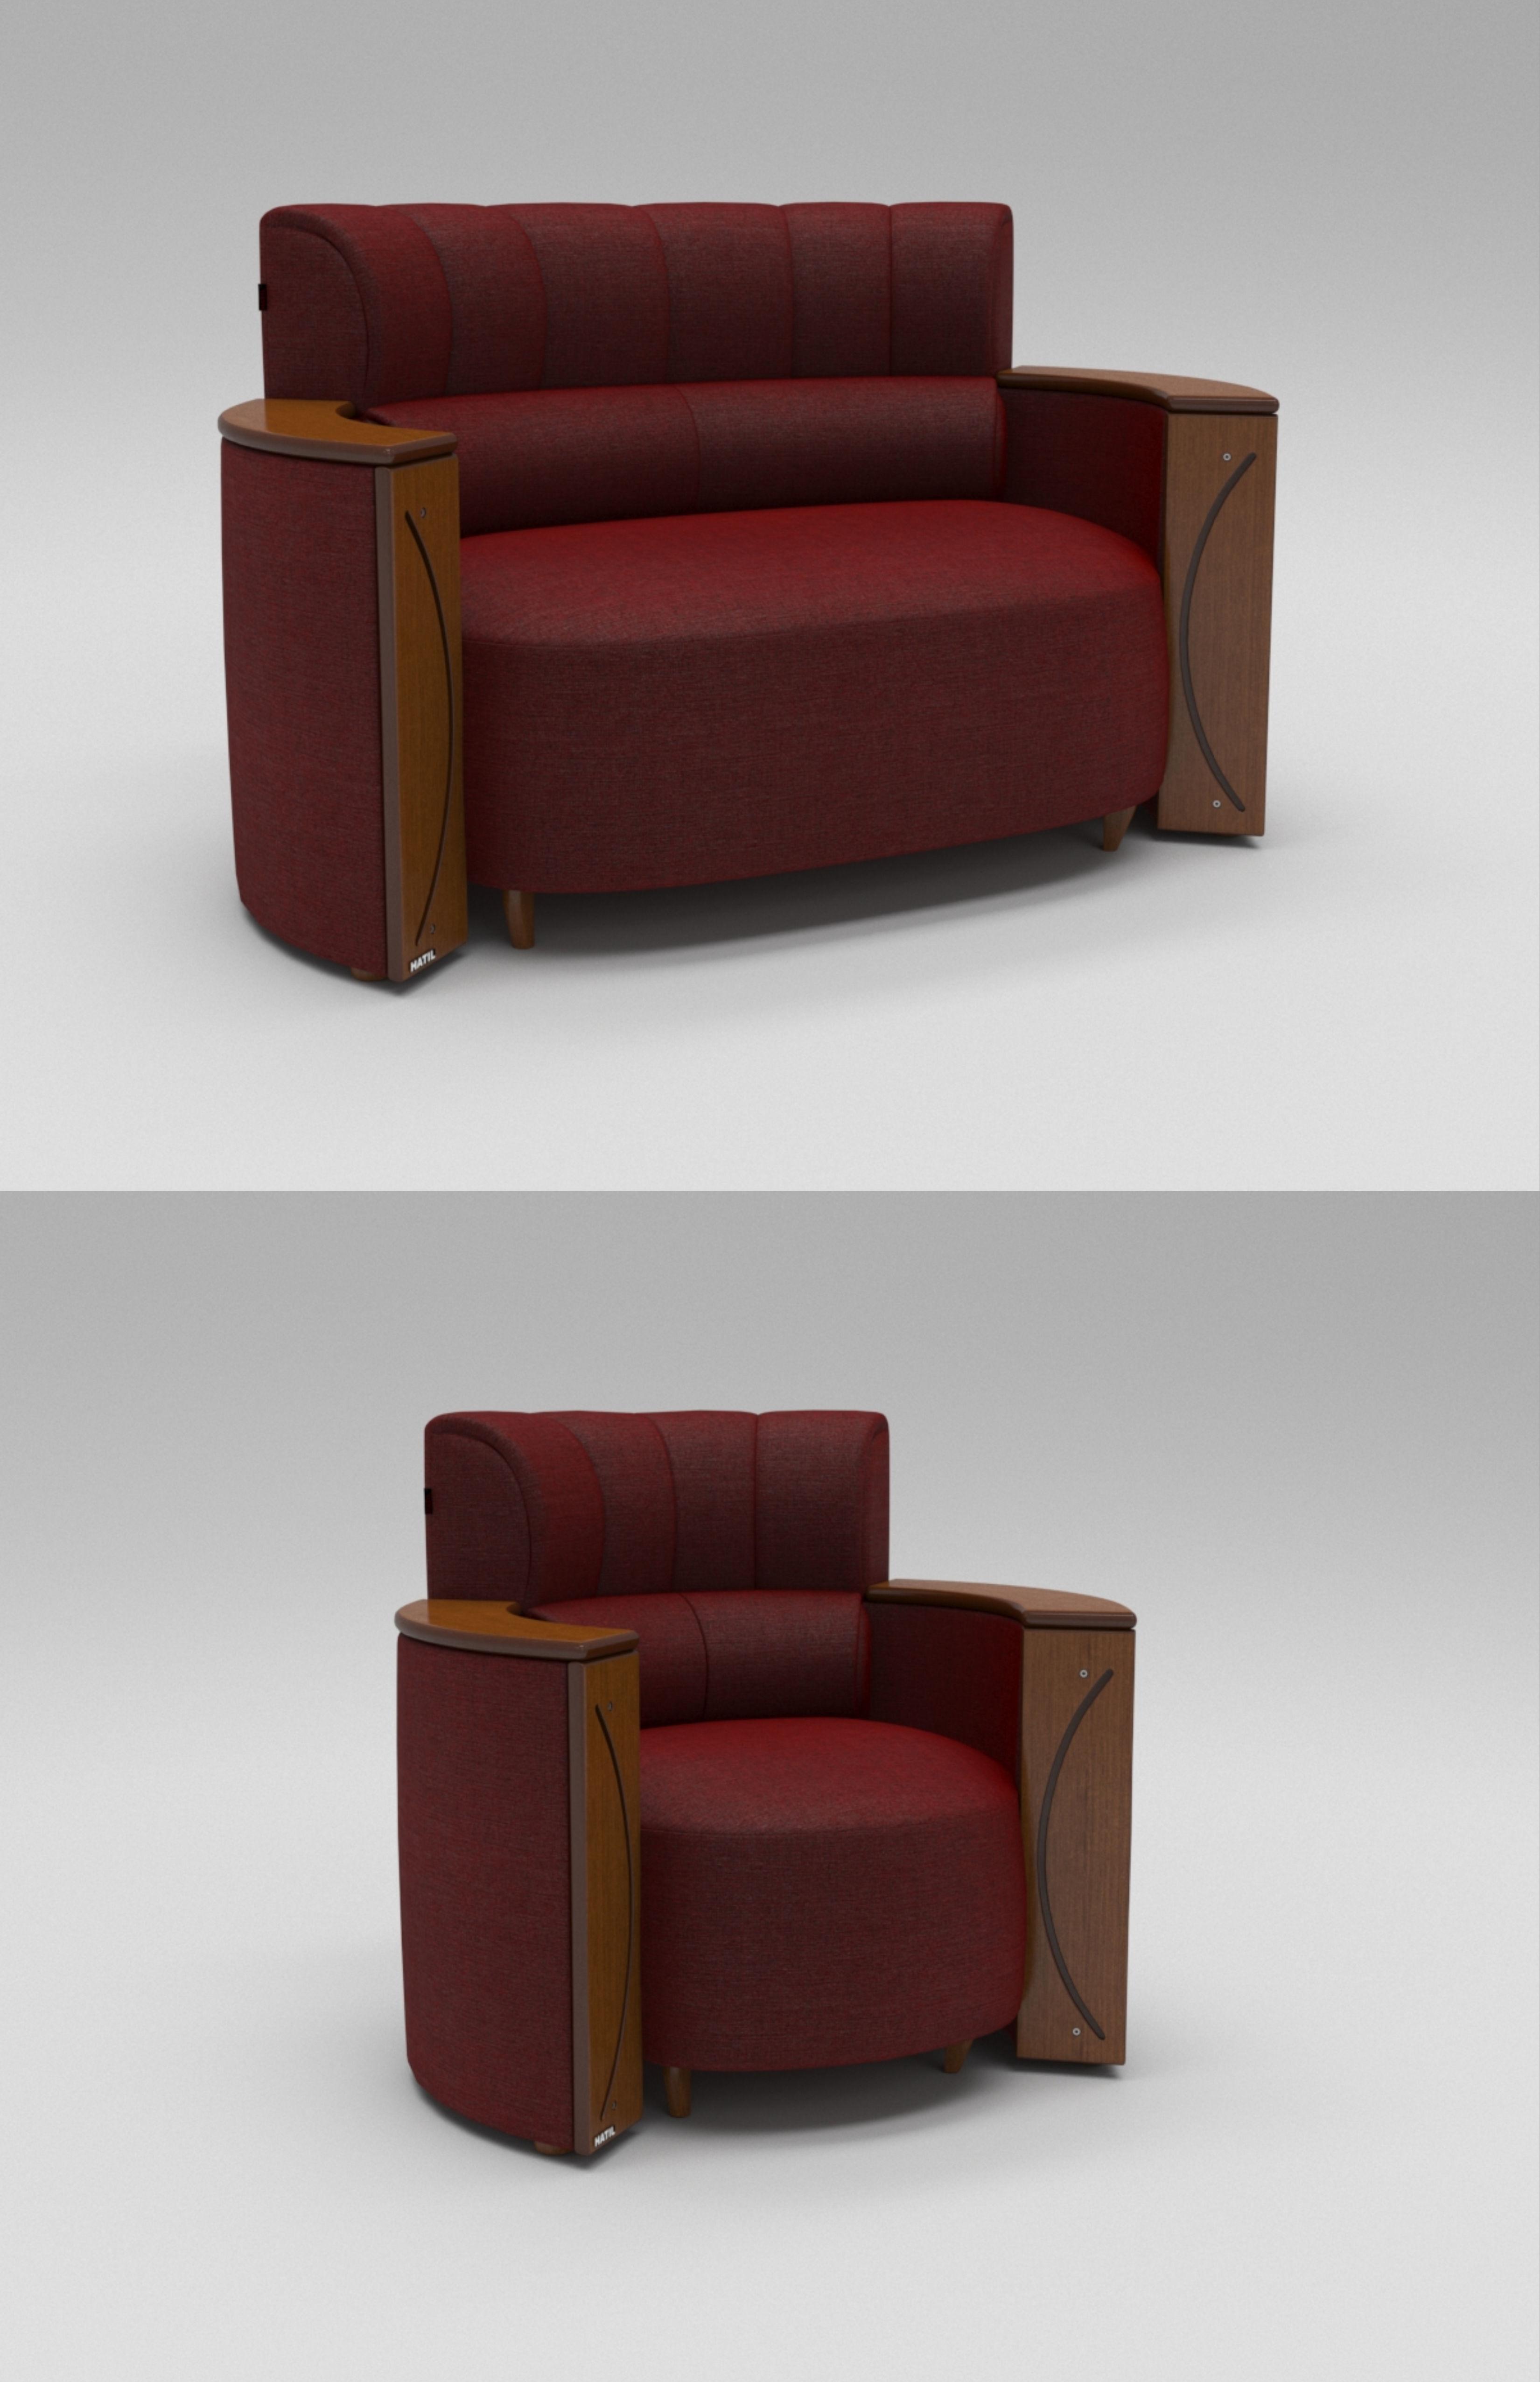 Cafelyn Sofa 3D Model